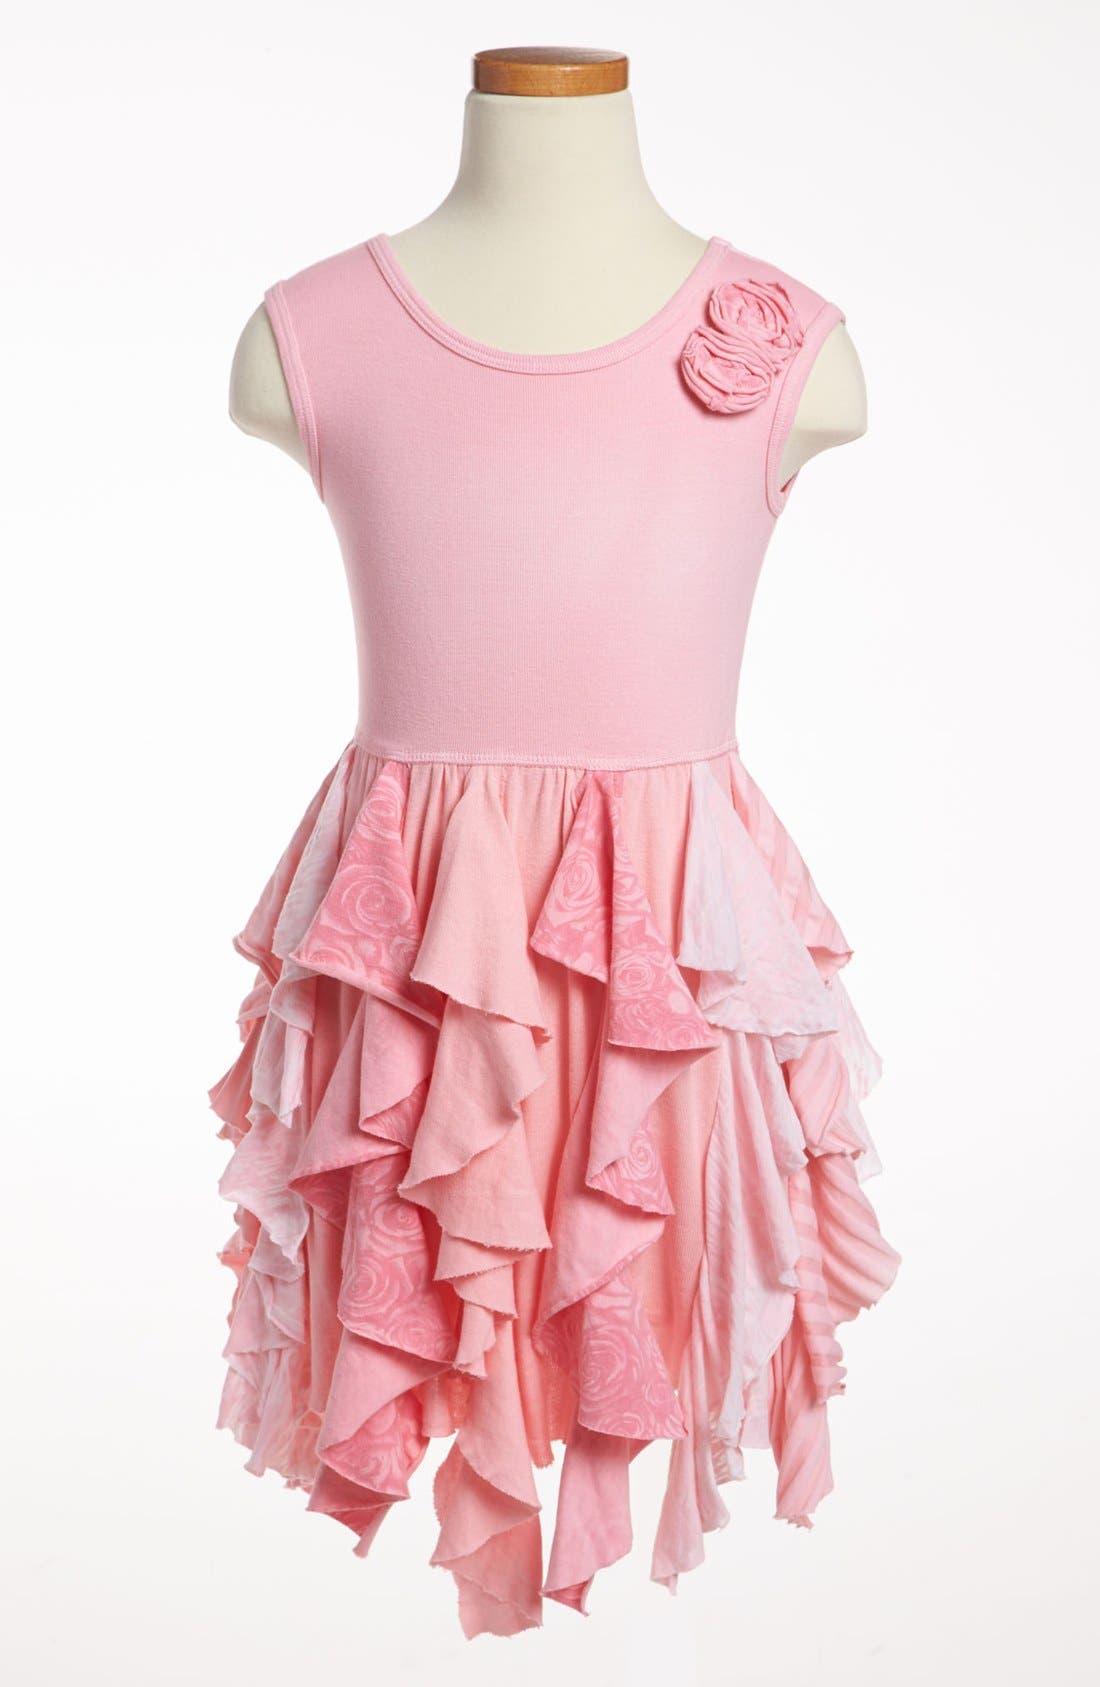 Main Image - Mignone Ruffle Skirt Dress (Little Girls & Big Girls)